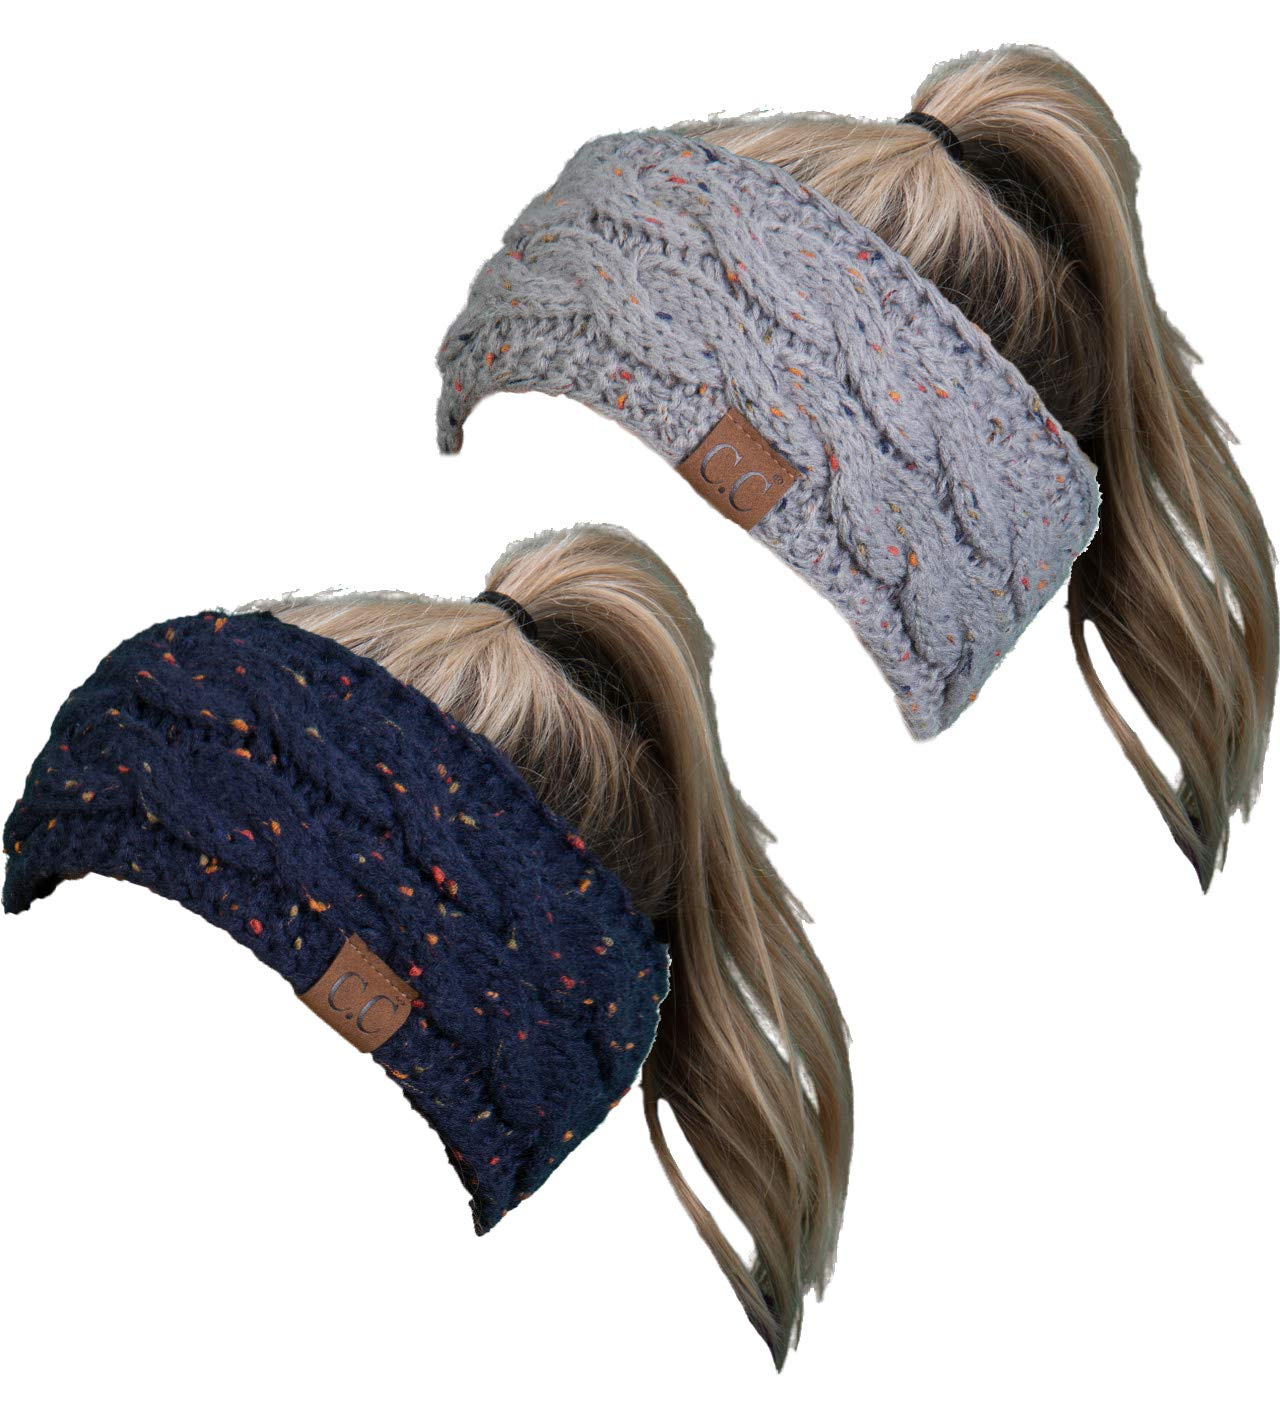 HW-6033-2-3176 Headwrap Bundle - Confetti Navy & Confetti Dove Grey (2 Pack)